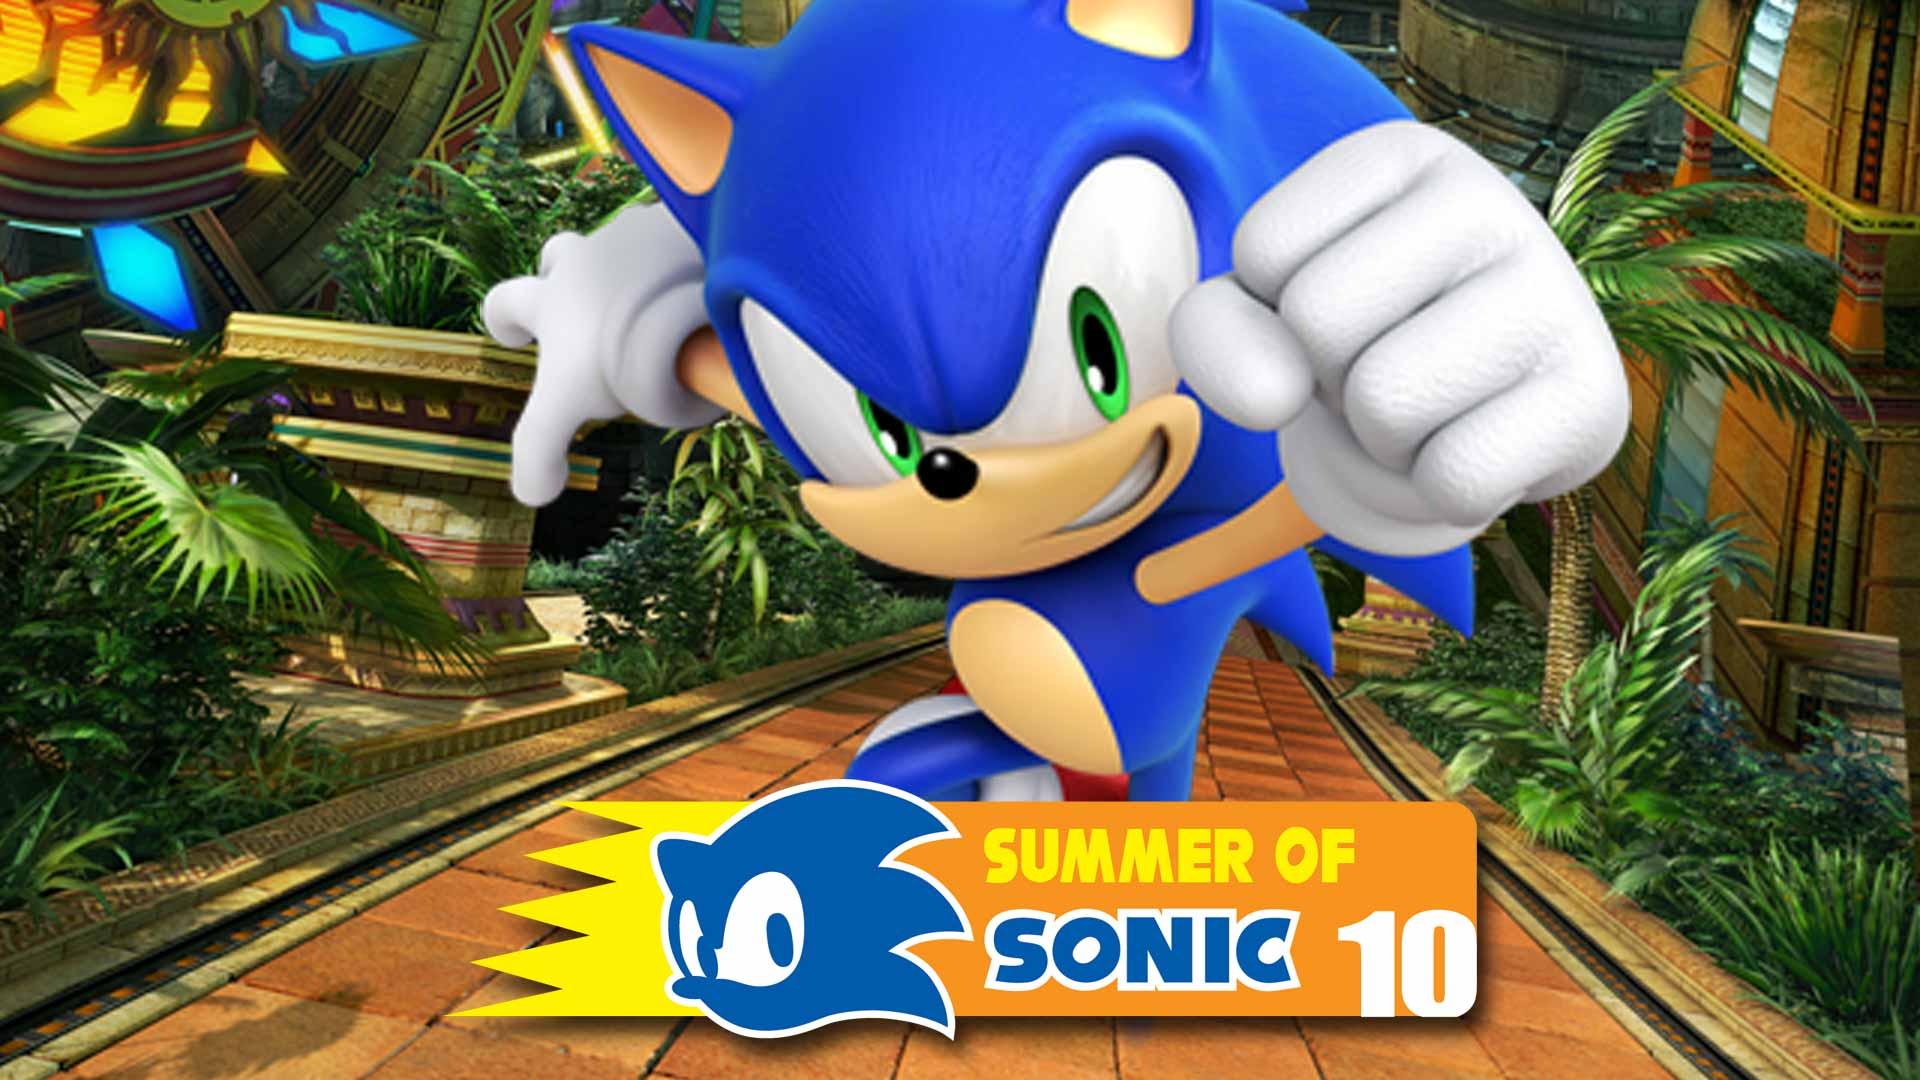 Summer Of Sonic 2010